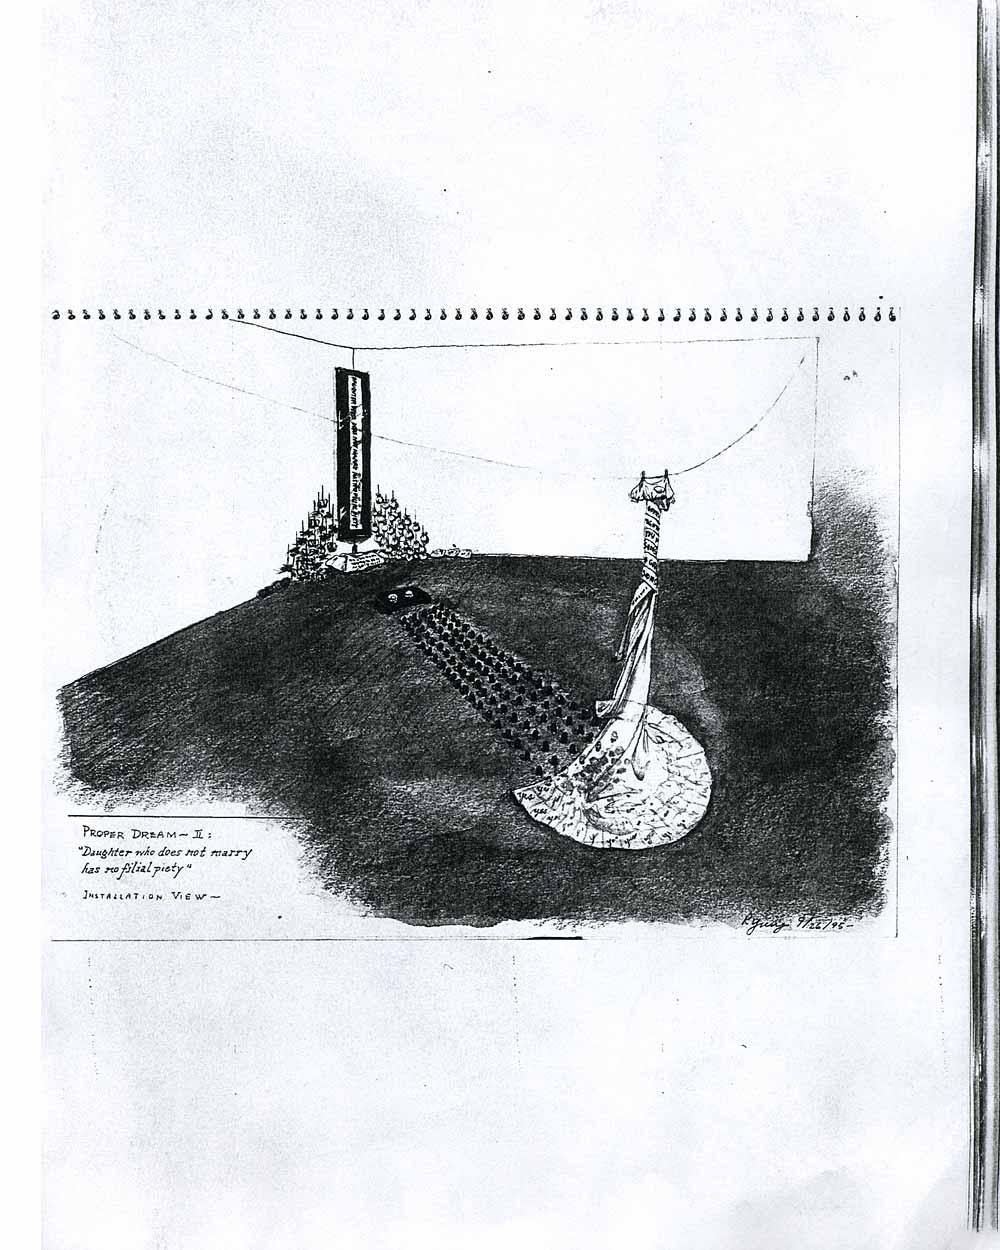 Proper Dream -II, production plan